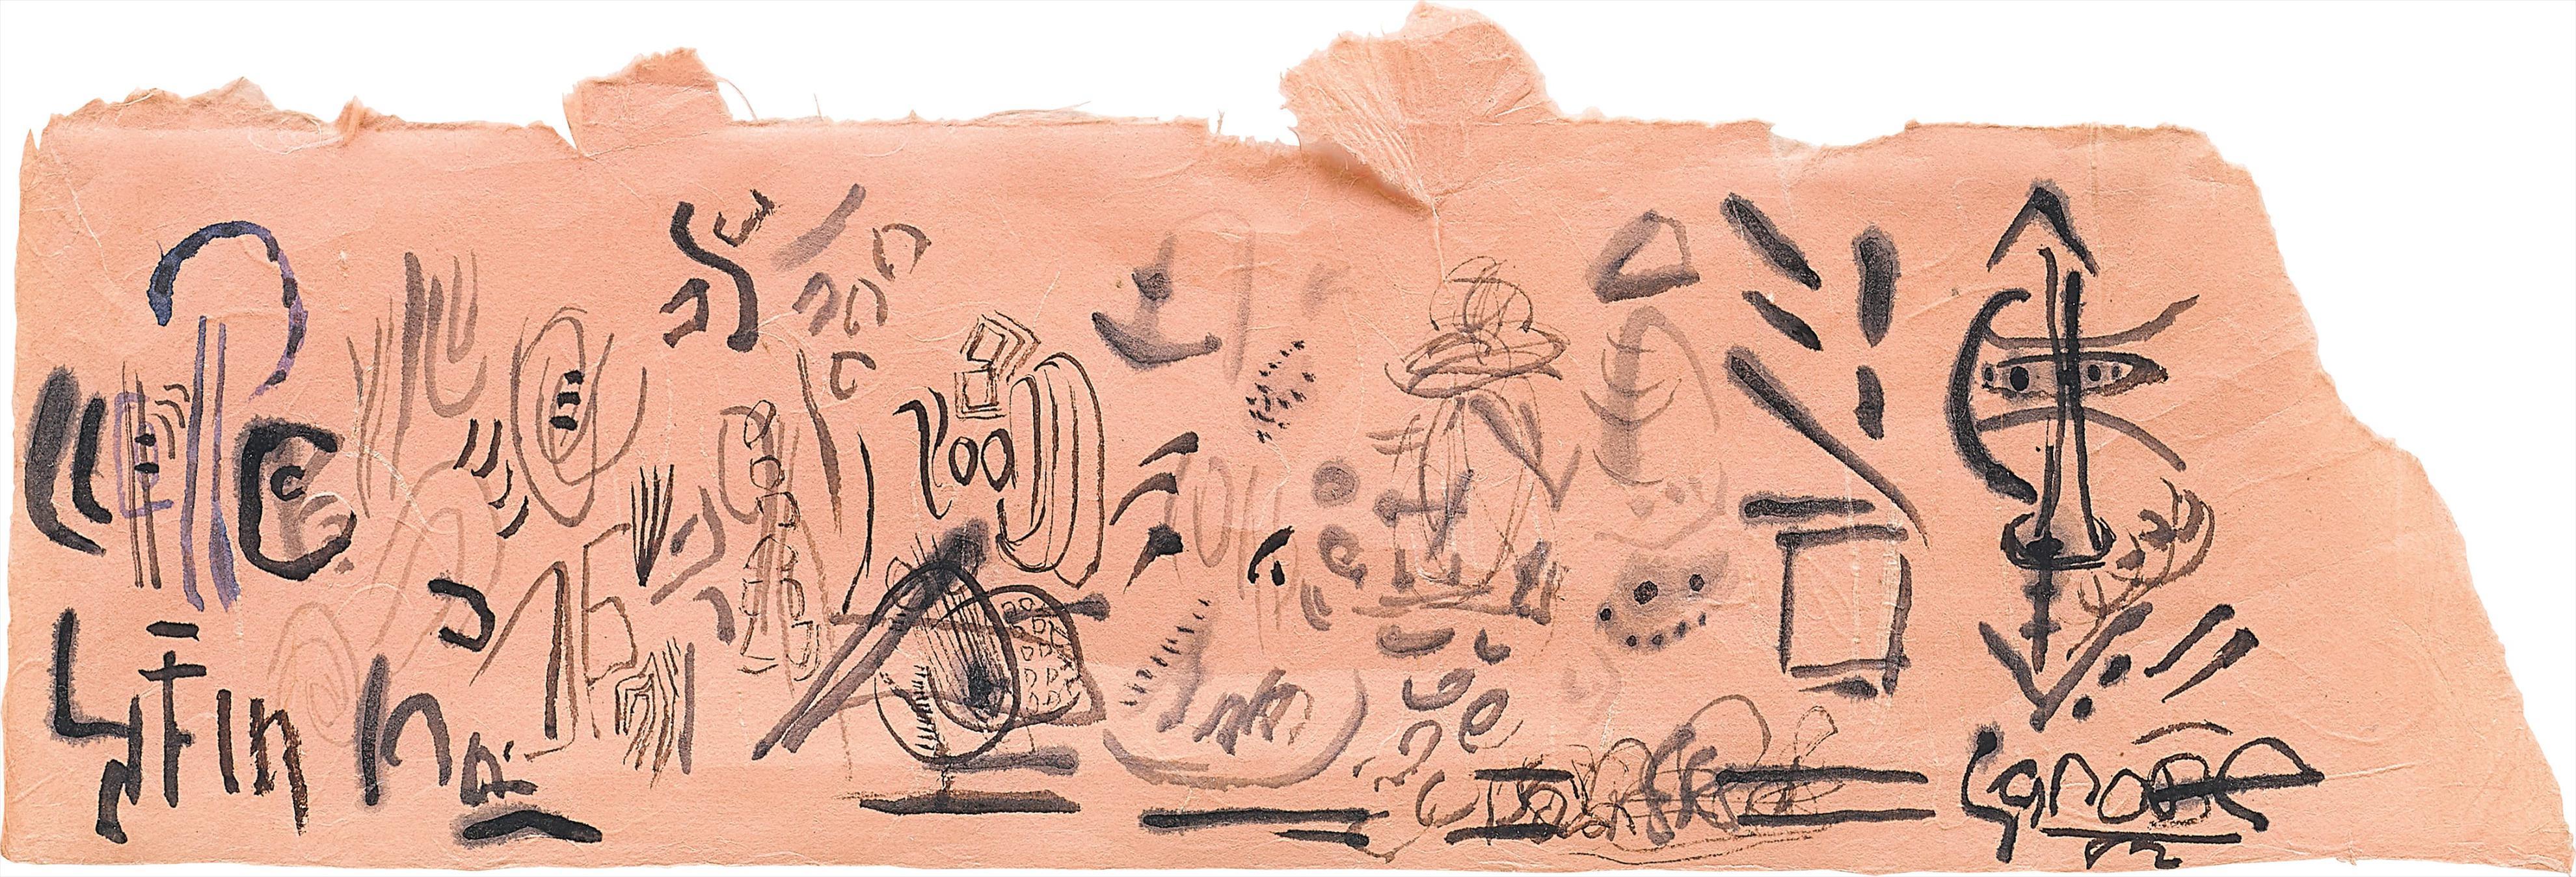 Jackson Pollock-Calligraph-1956